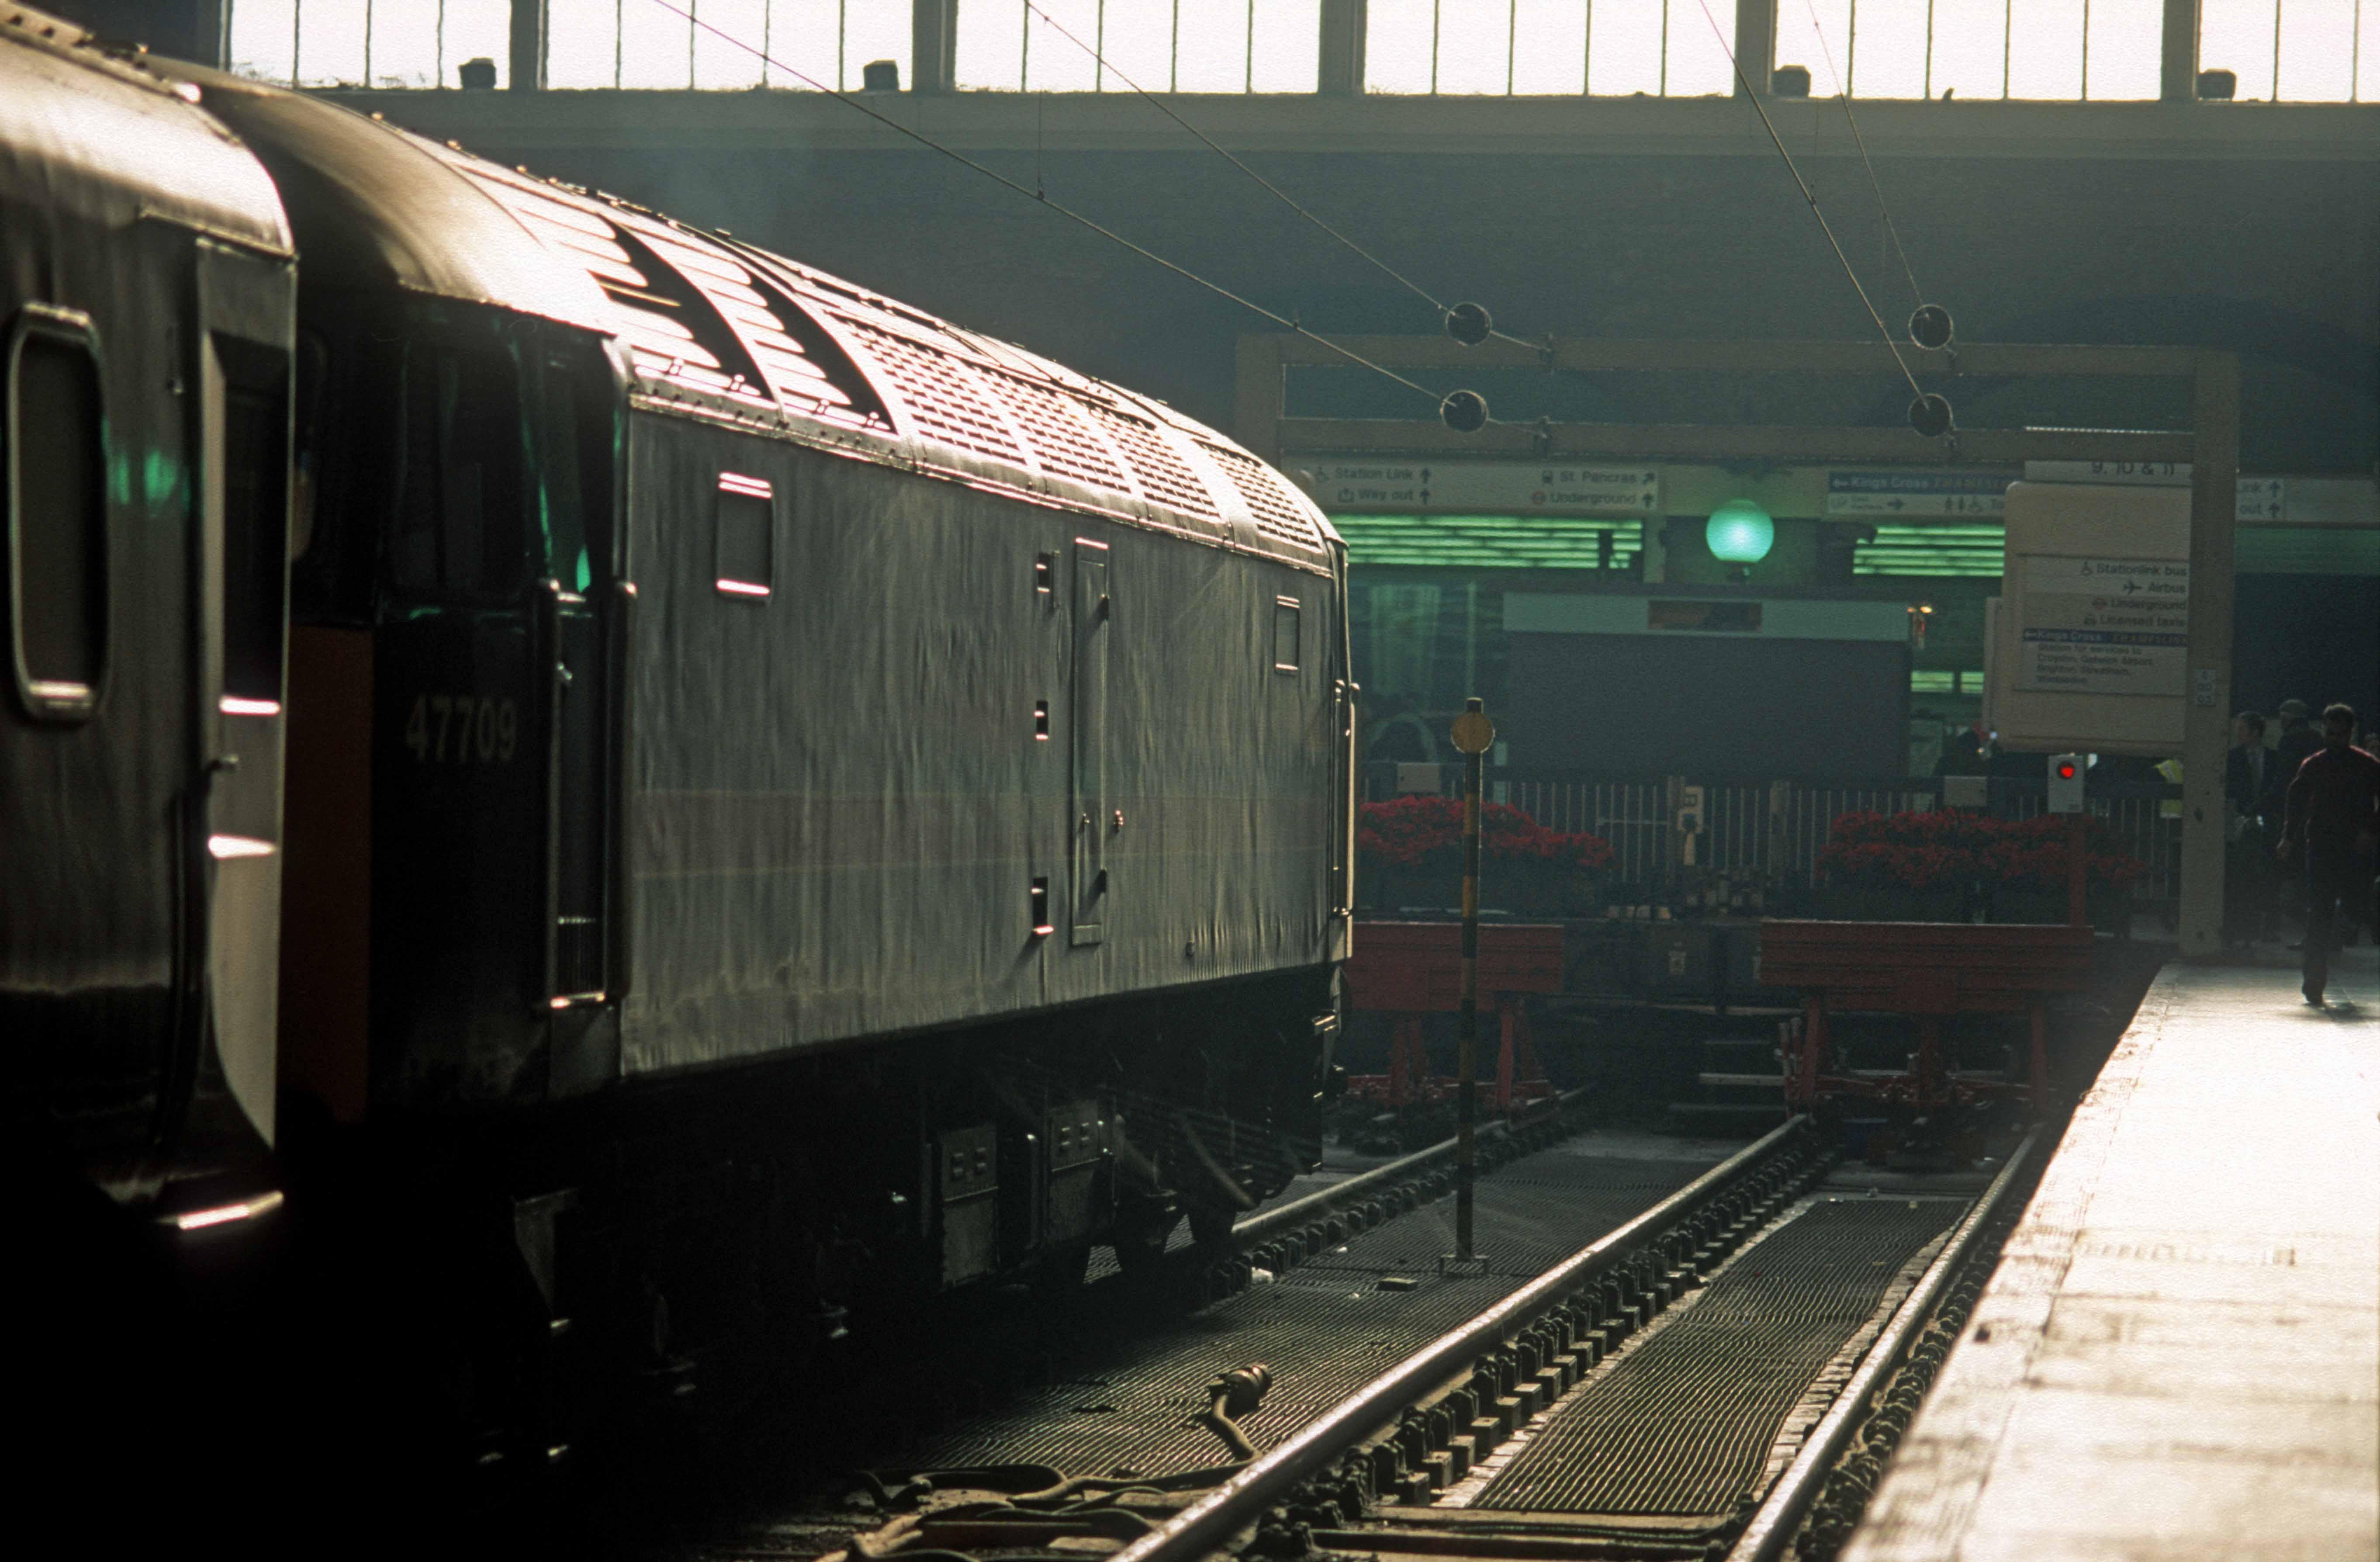 07451. 47709. Regency railtour Ex-Newcastle. ECS to Bounds Green London Kings Cross. 16.12.1999crop